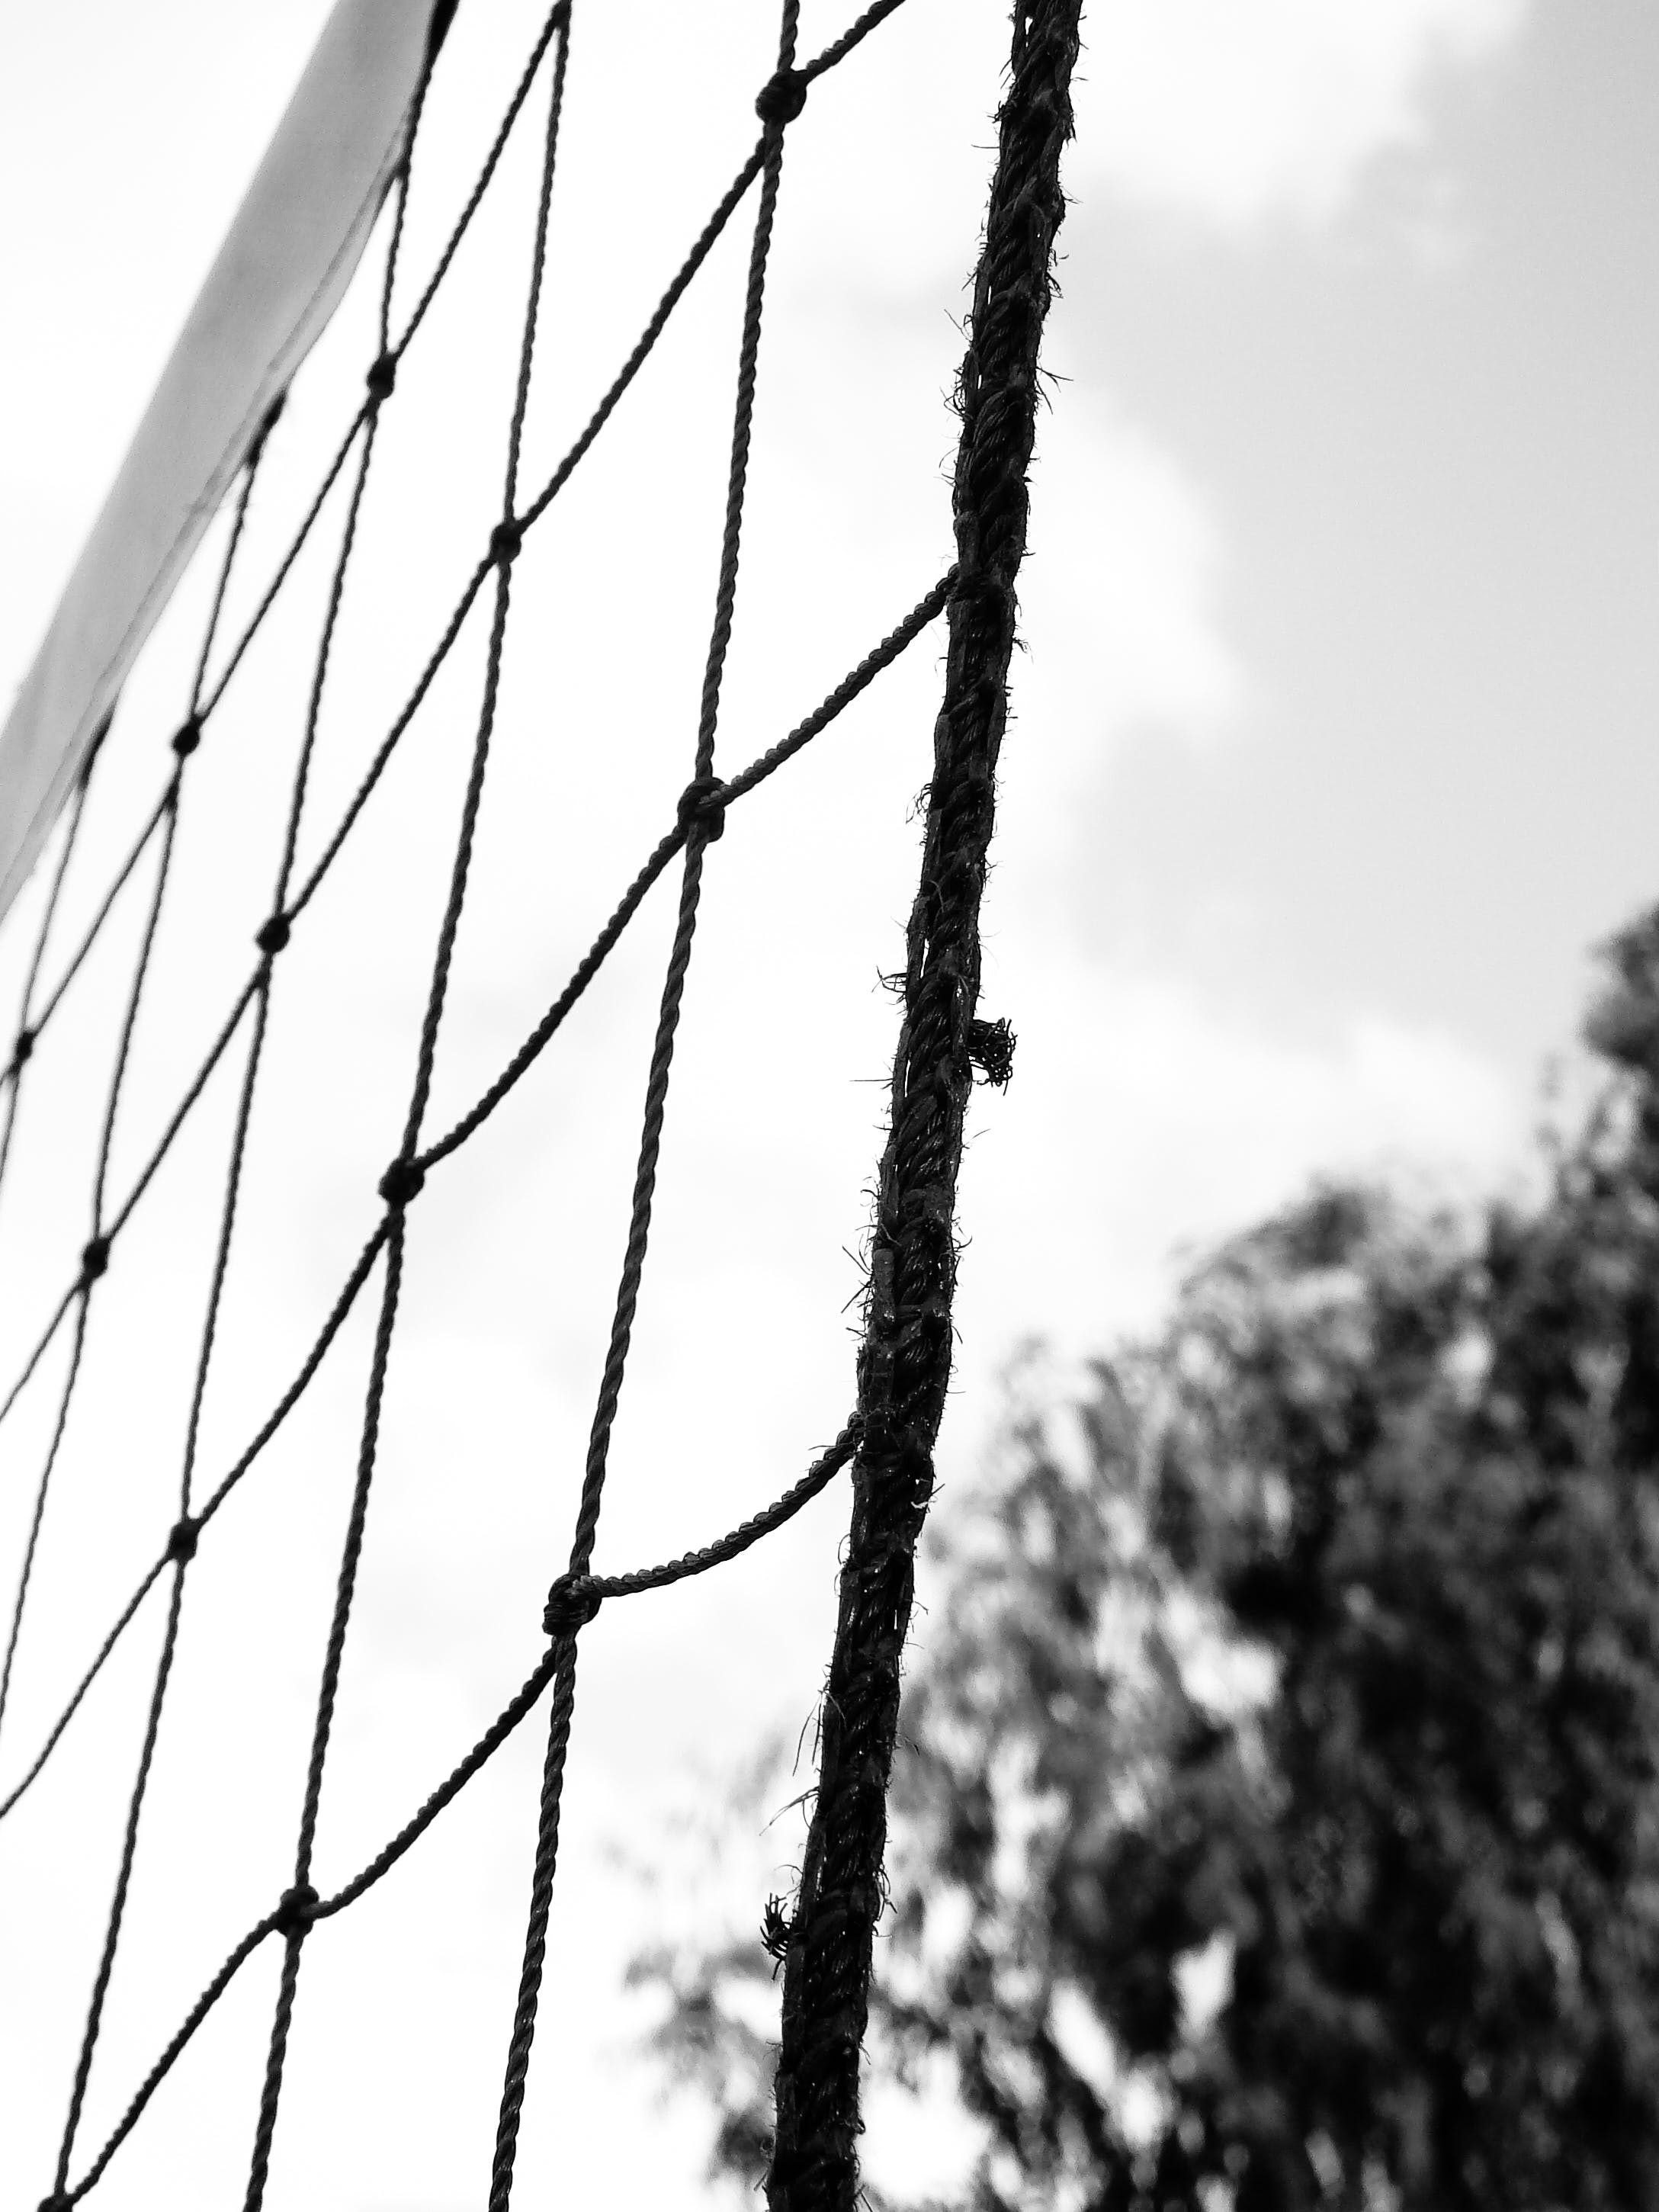 Free stock photo of Adobe Photoshop, adventure, art, black and white